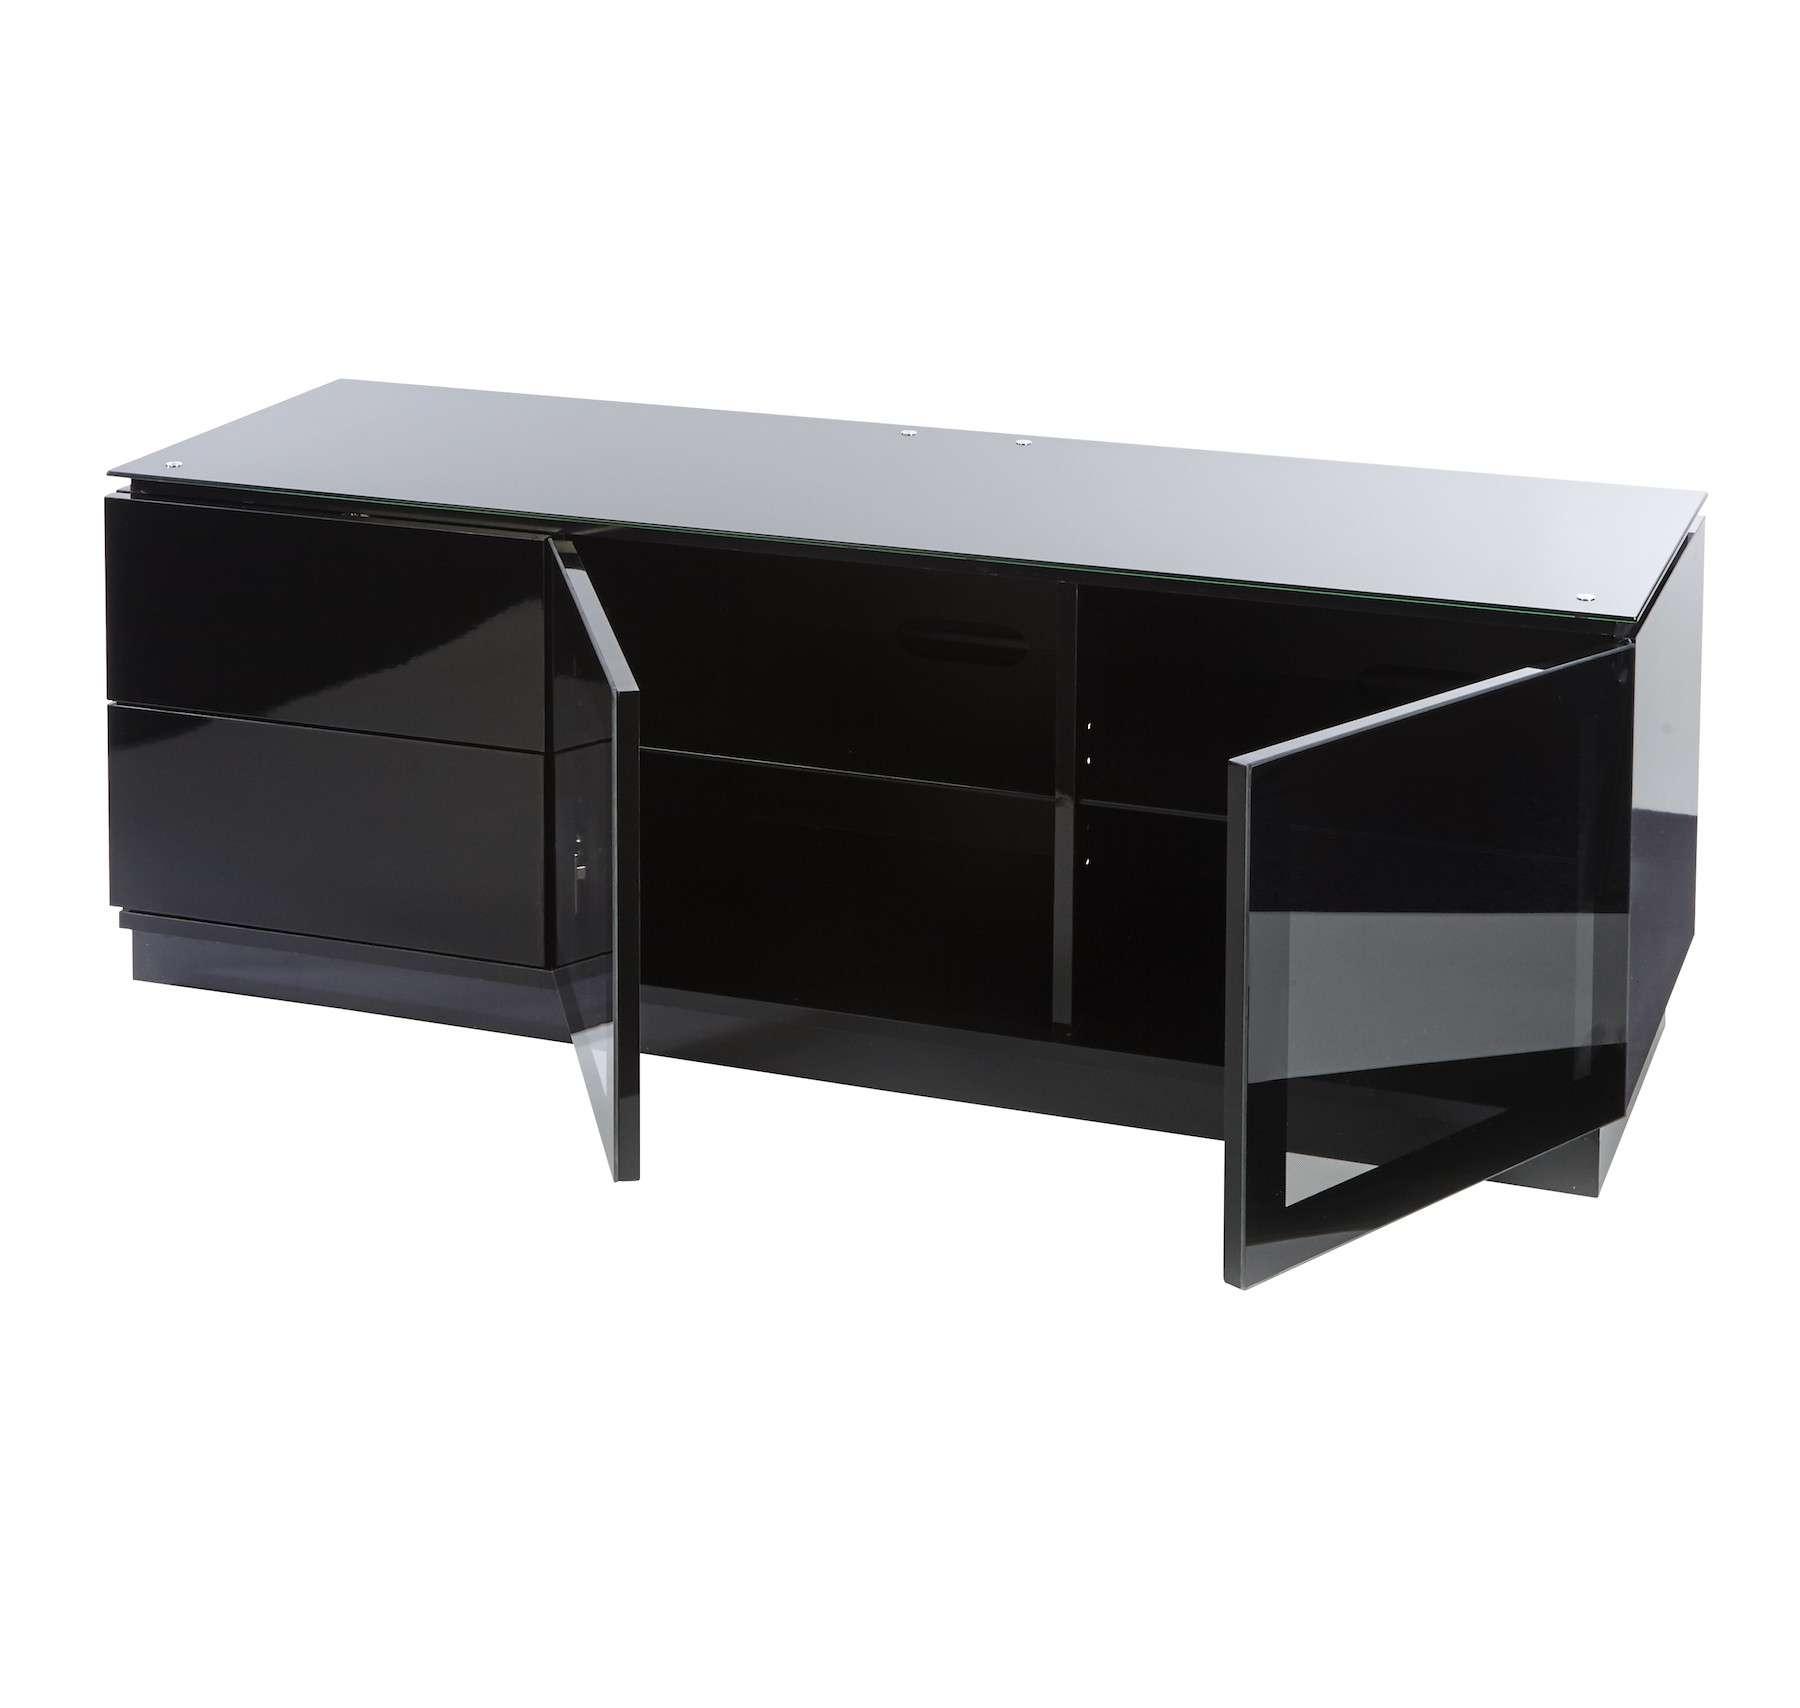 "Black Gloss Tv Cabinet Up To 55"" Tv | Casino Mmt C1350b For Black Gloss Tv Cabinets (View 14 of 20)"